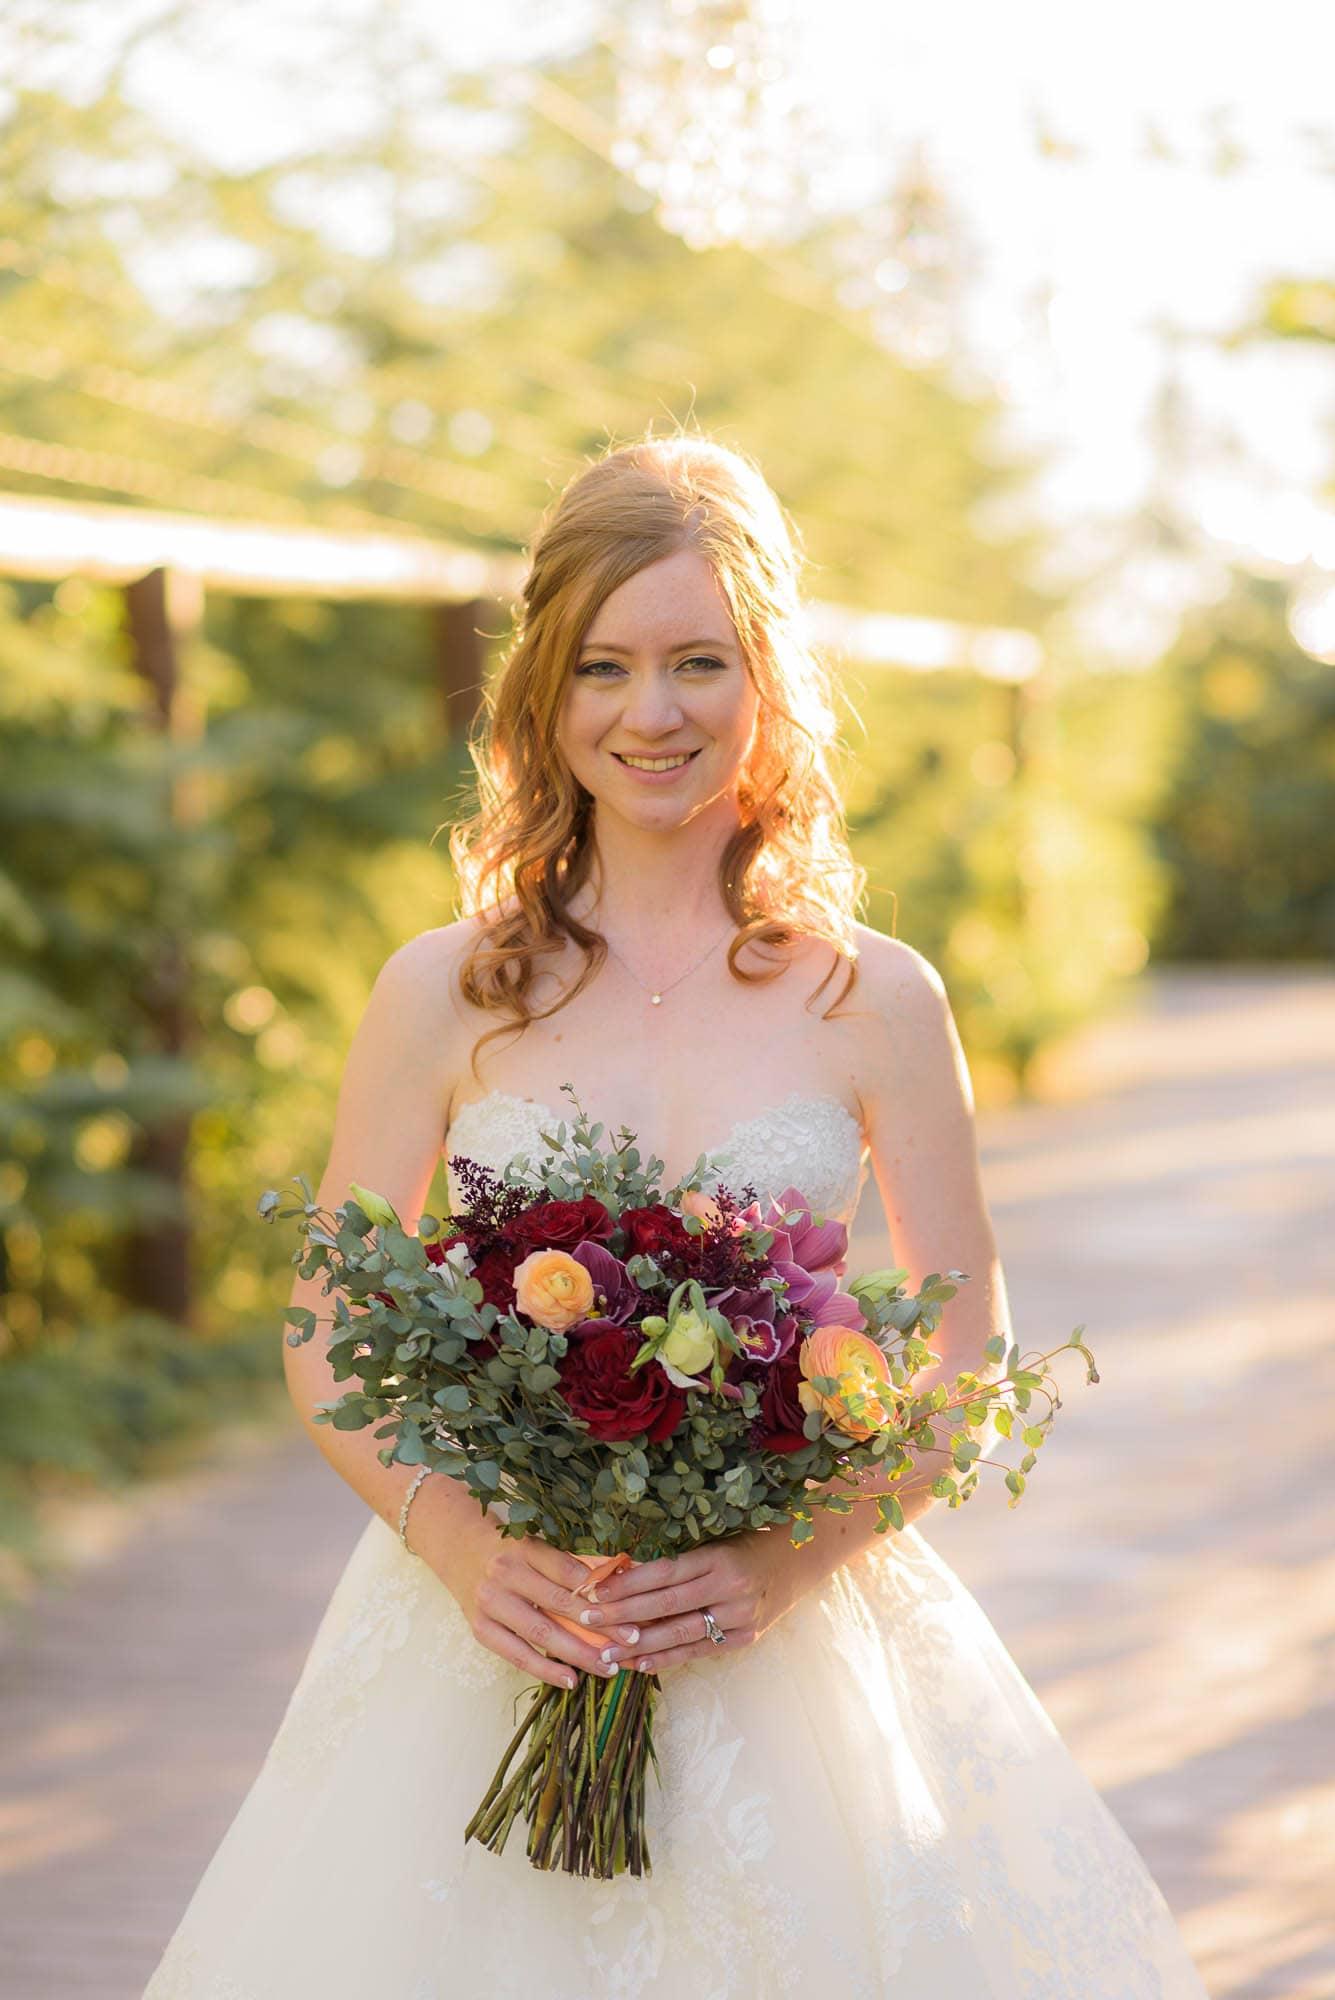 427_Alan_and_Heidi_Serendipity_Garden_Wedding_10-27-2018